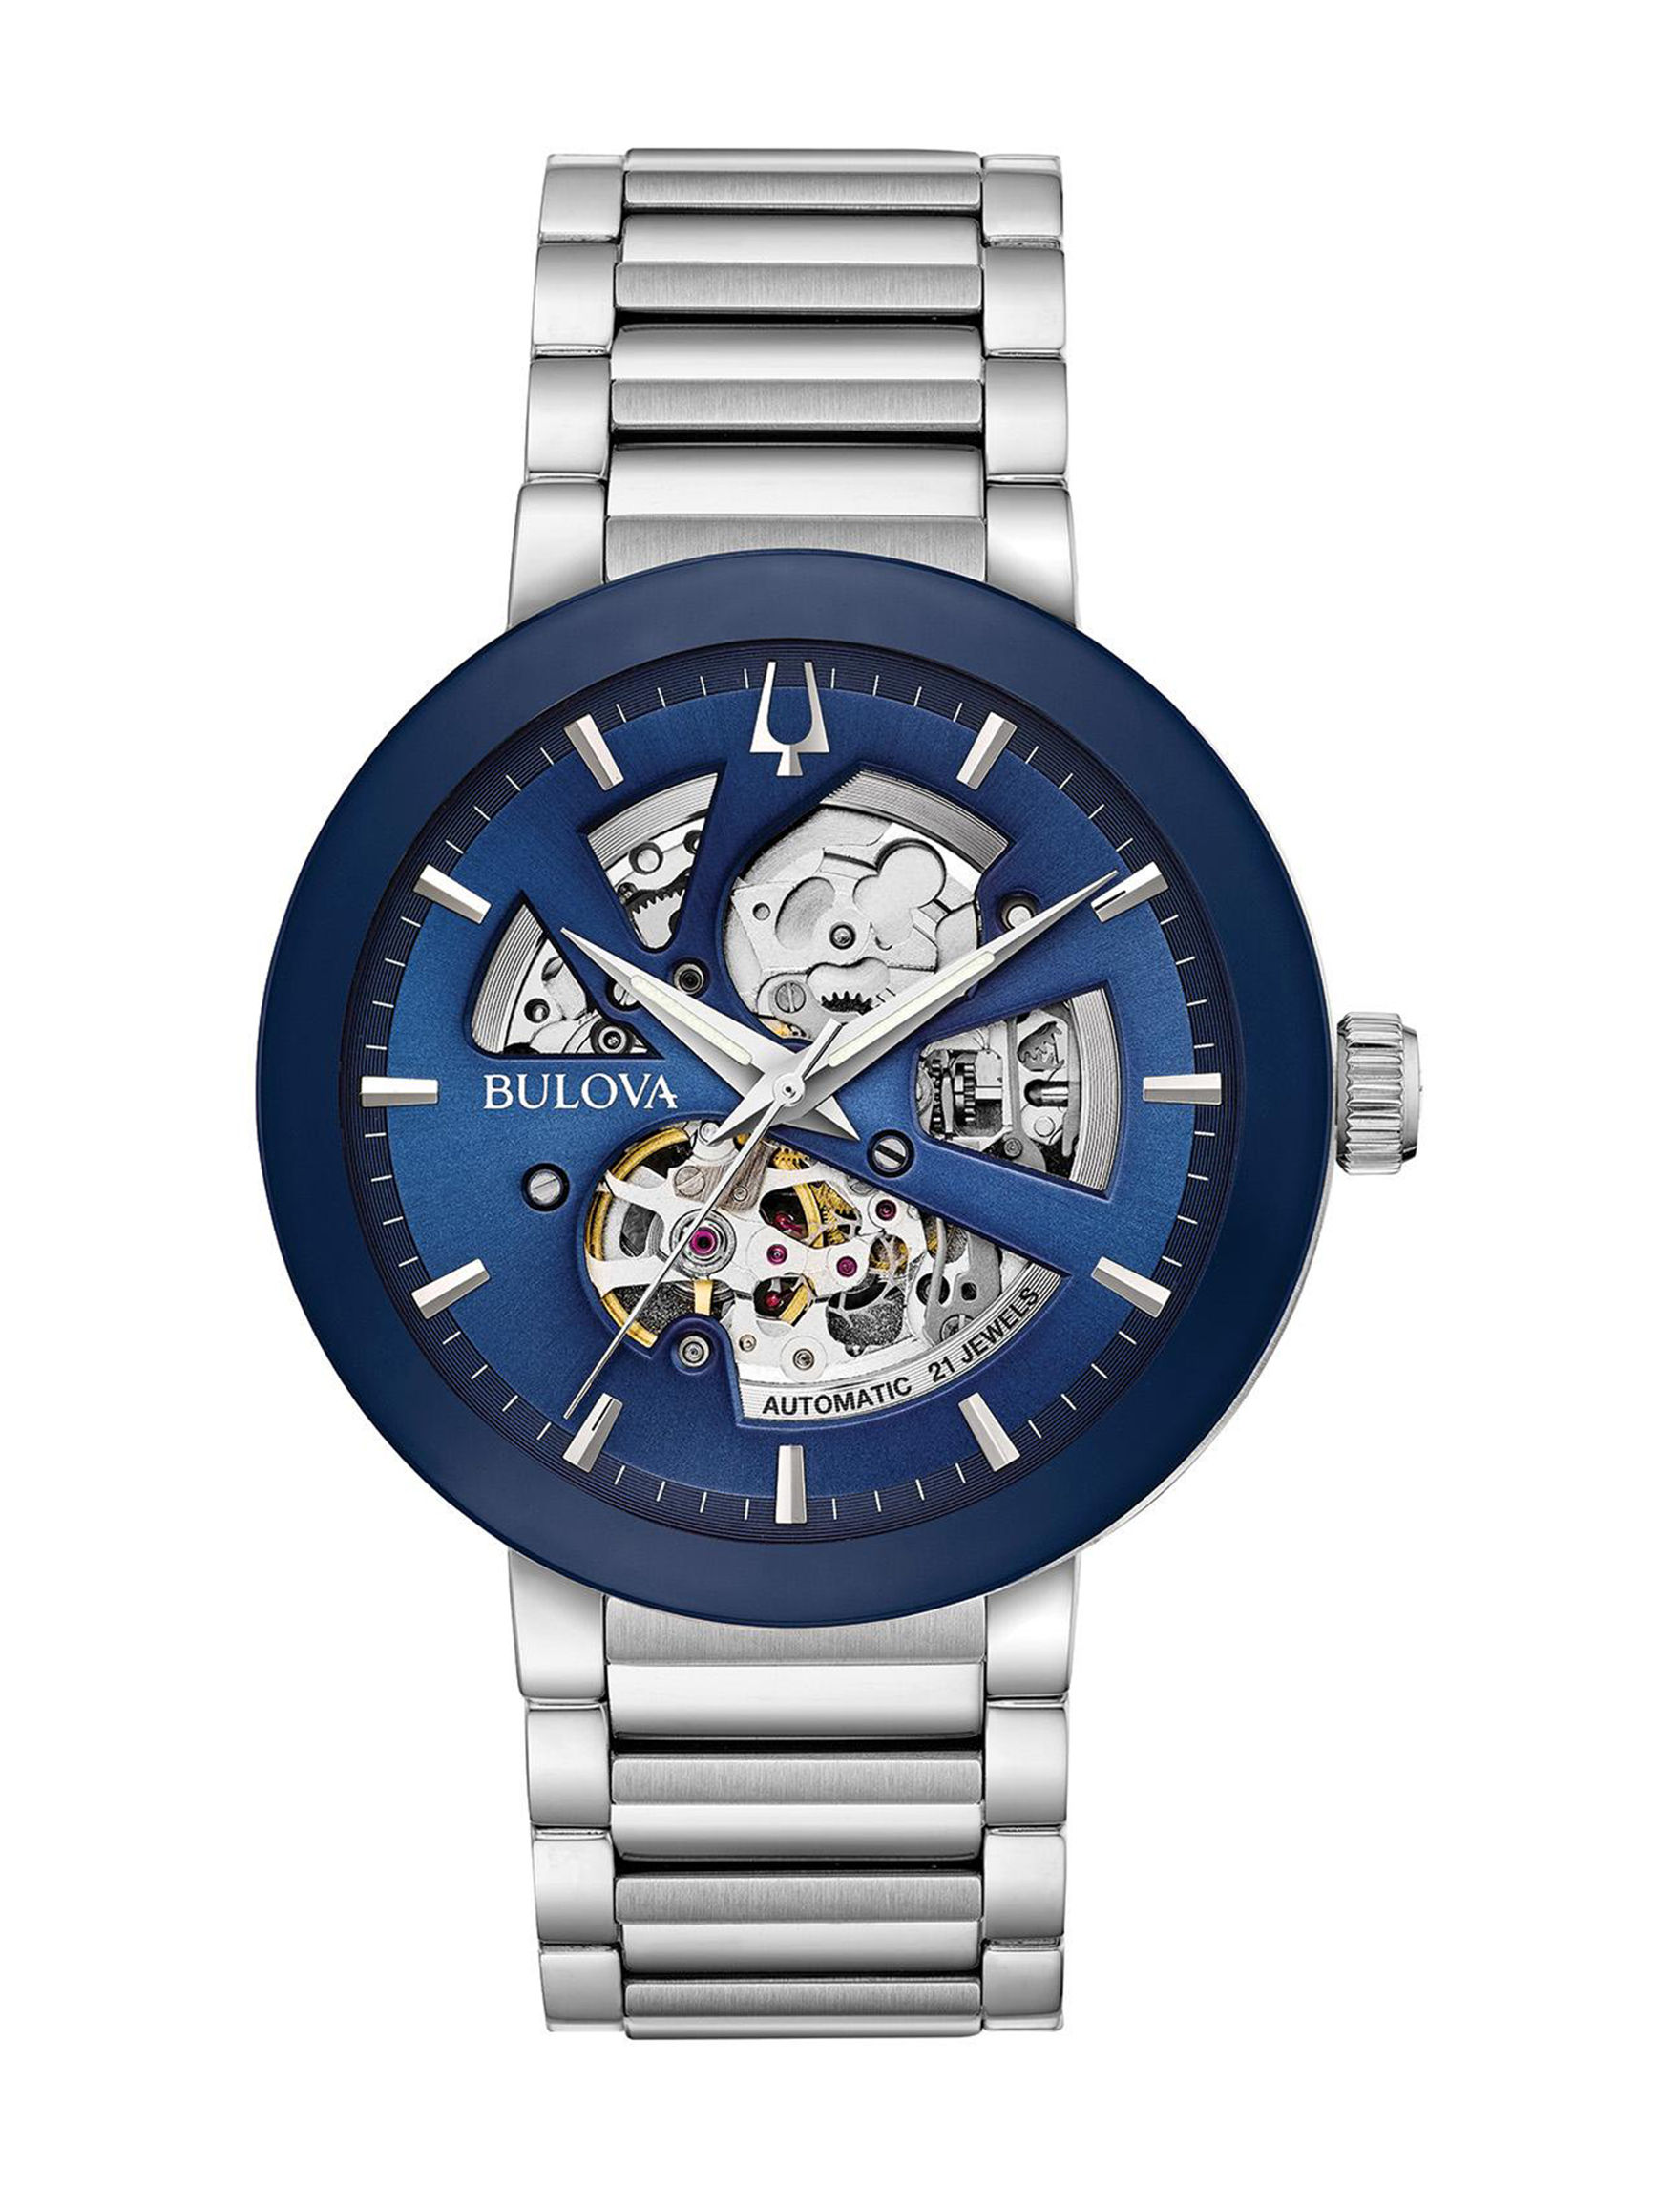 Bulova Blue / Silver Fashion Watches